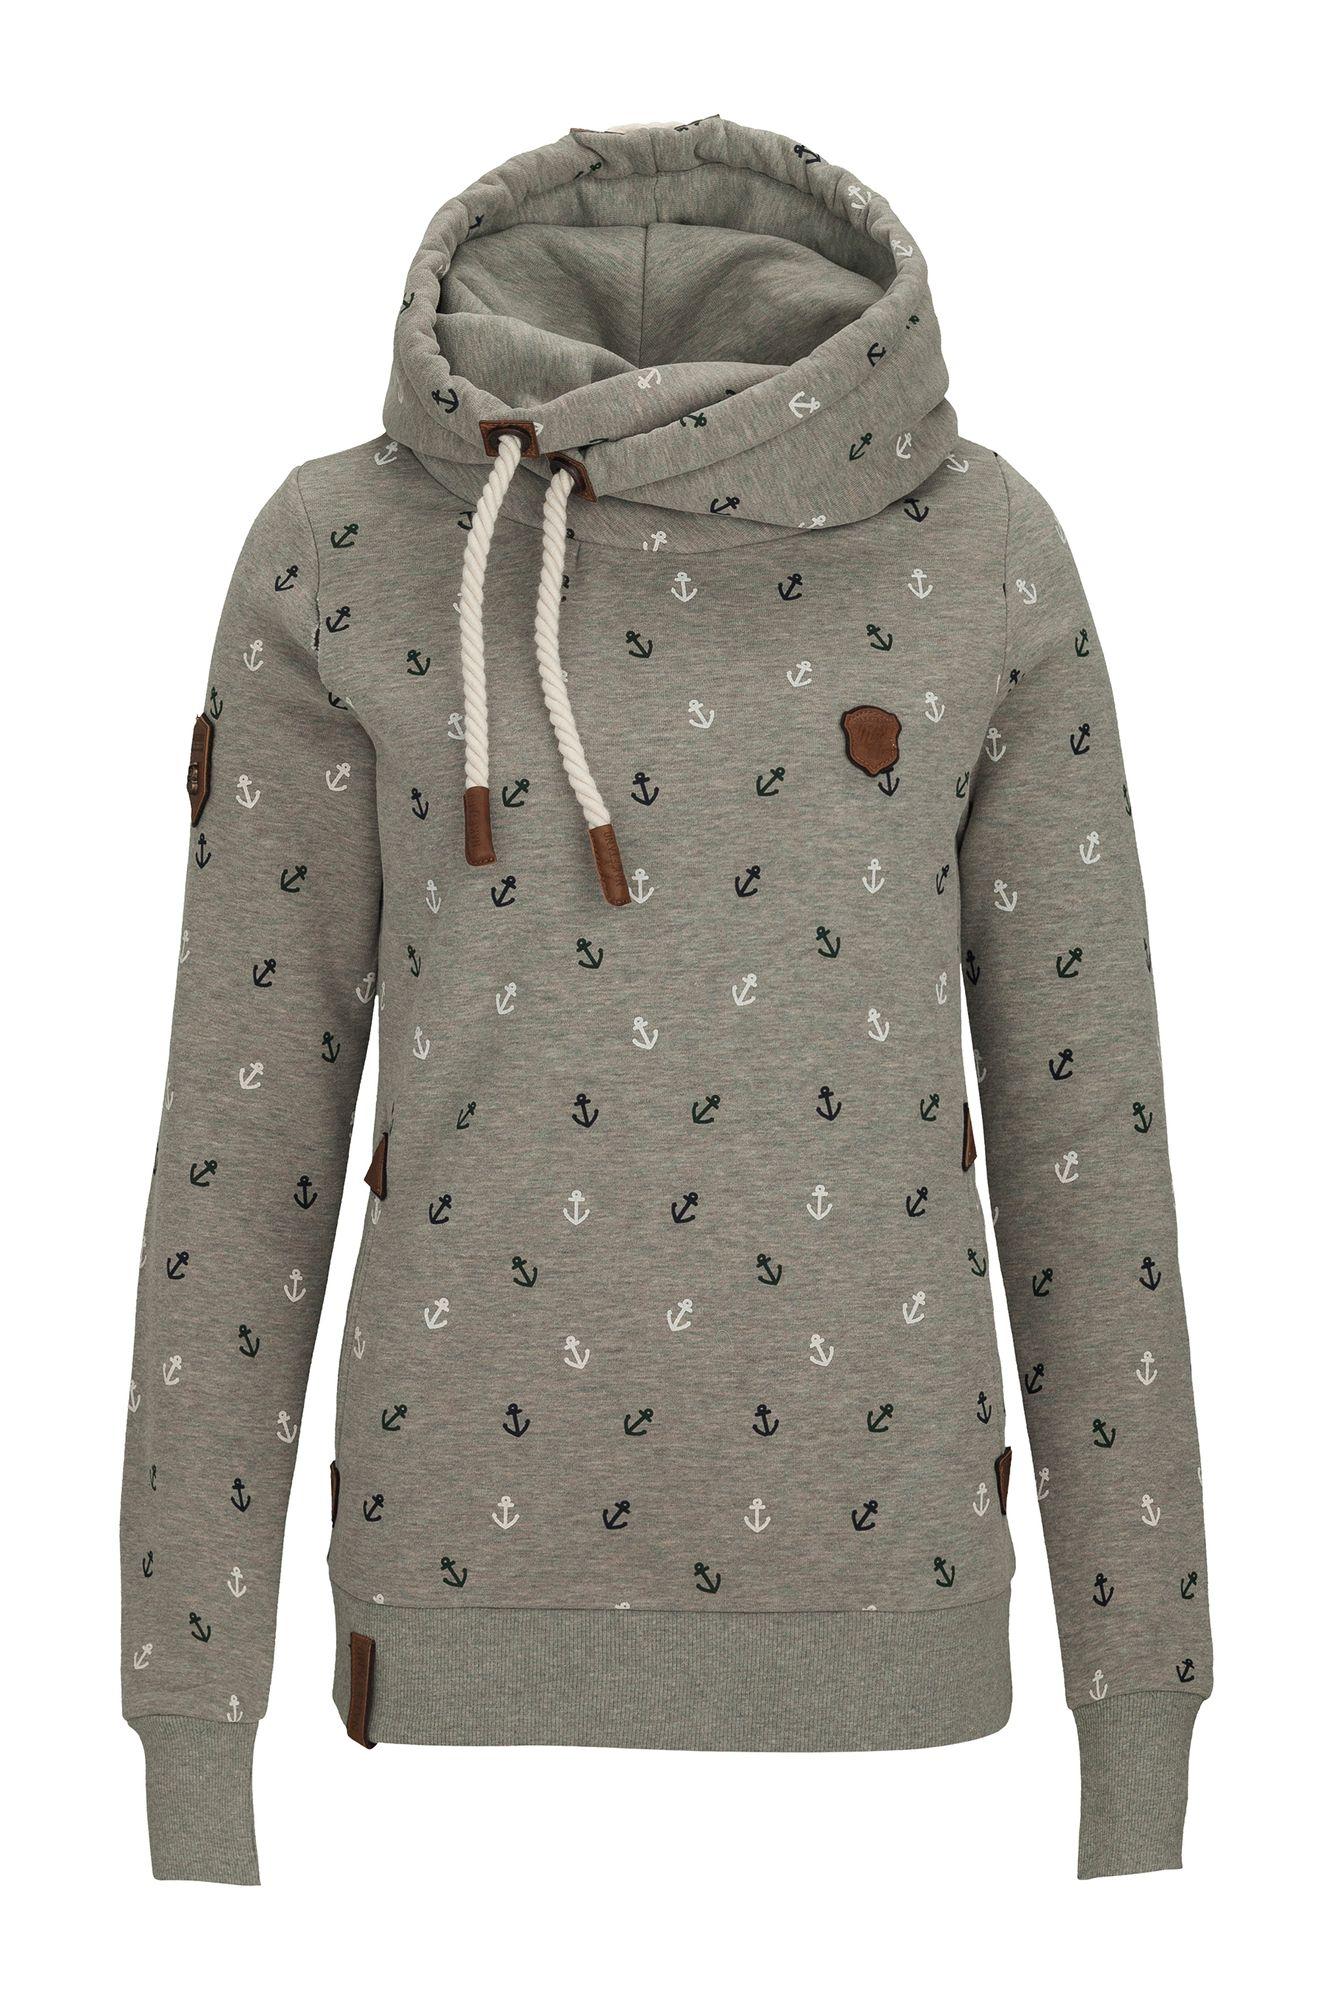 Naketano Guts over Fear W hoodie turquoise heather